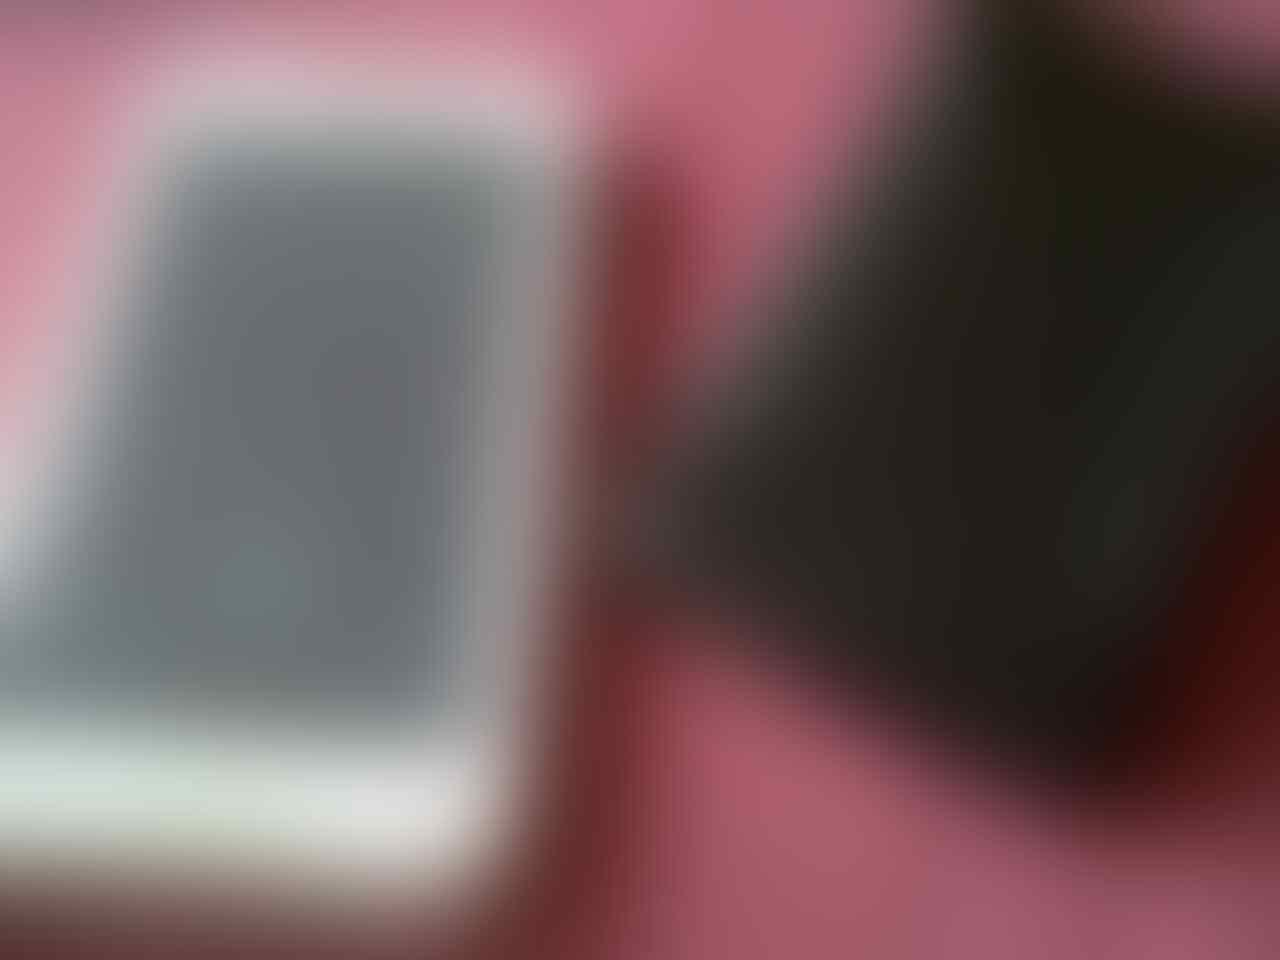 Lenovo S880 White Fullset Mulus (mint condition) 2 bln pakai